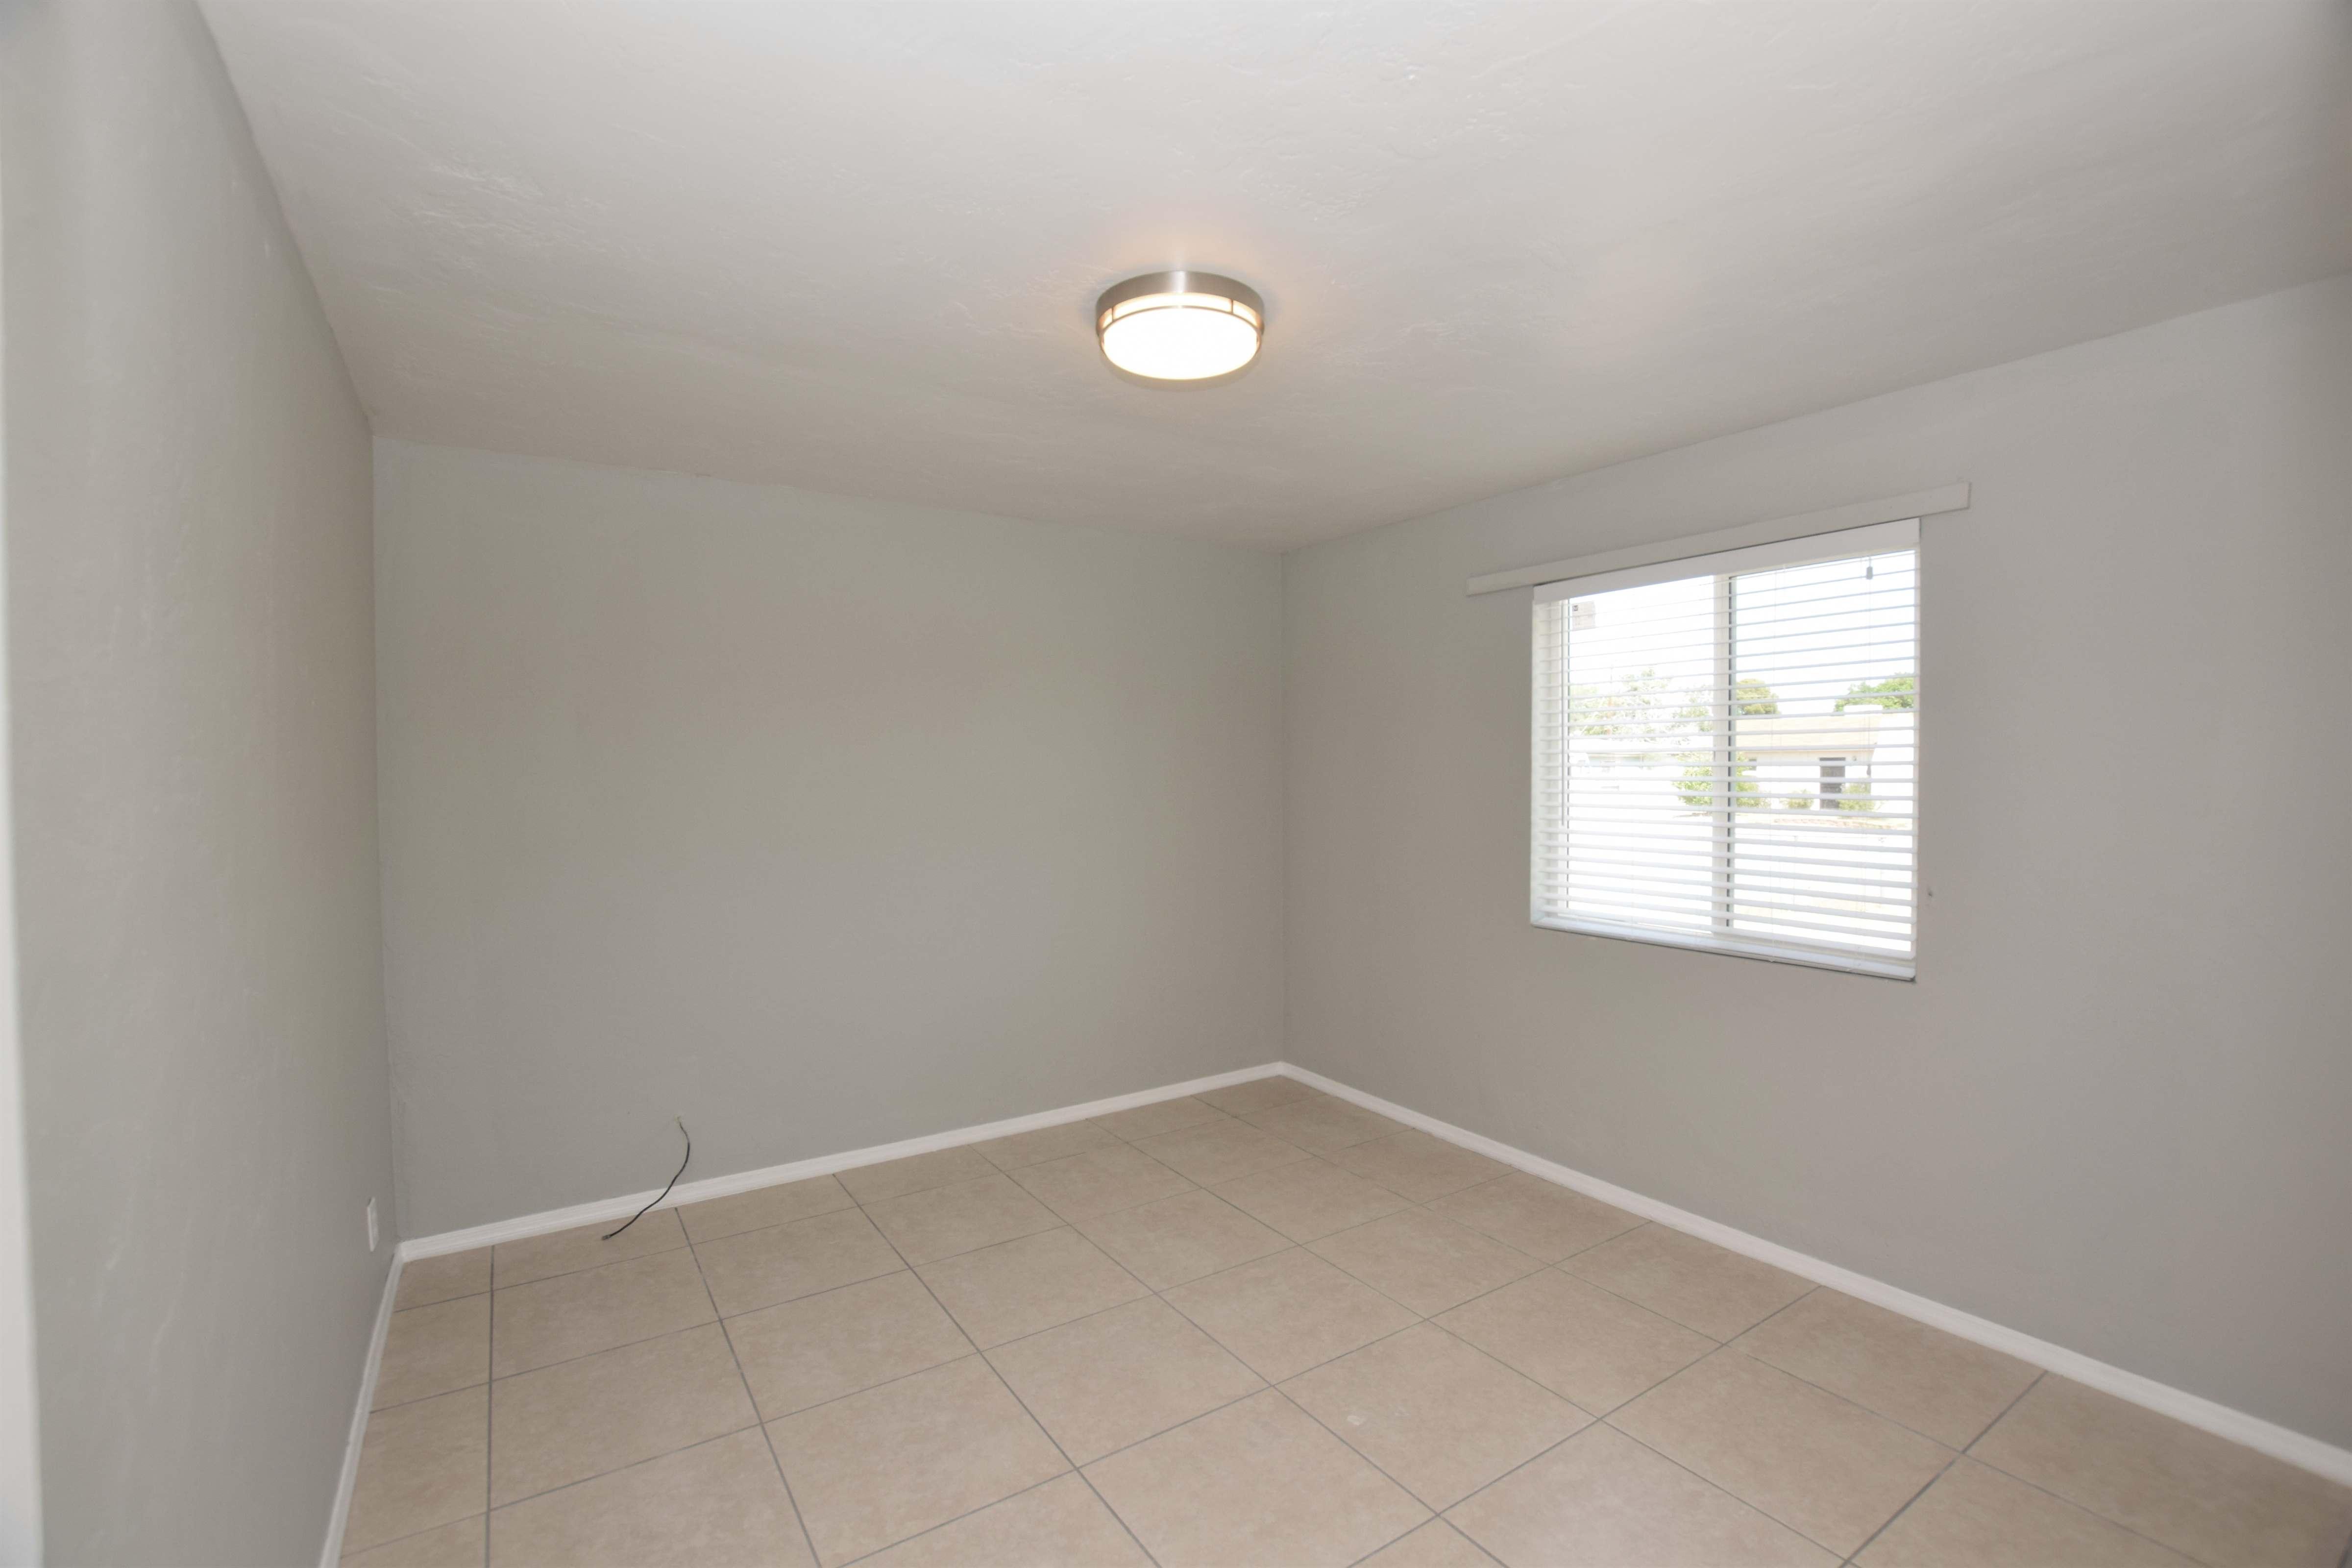 909 W Calle Francita, Tucson, AZ 85706